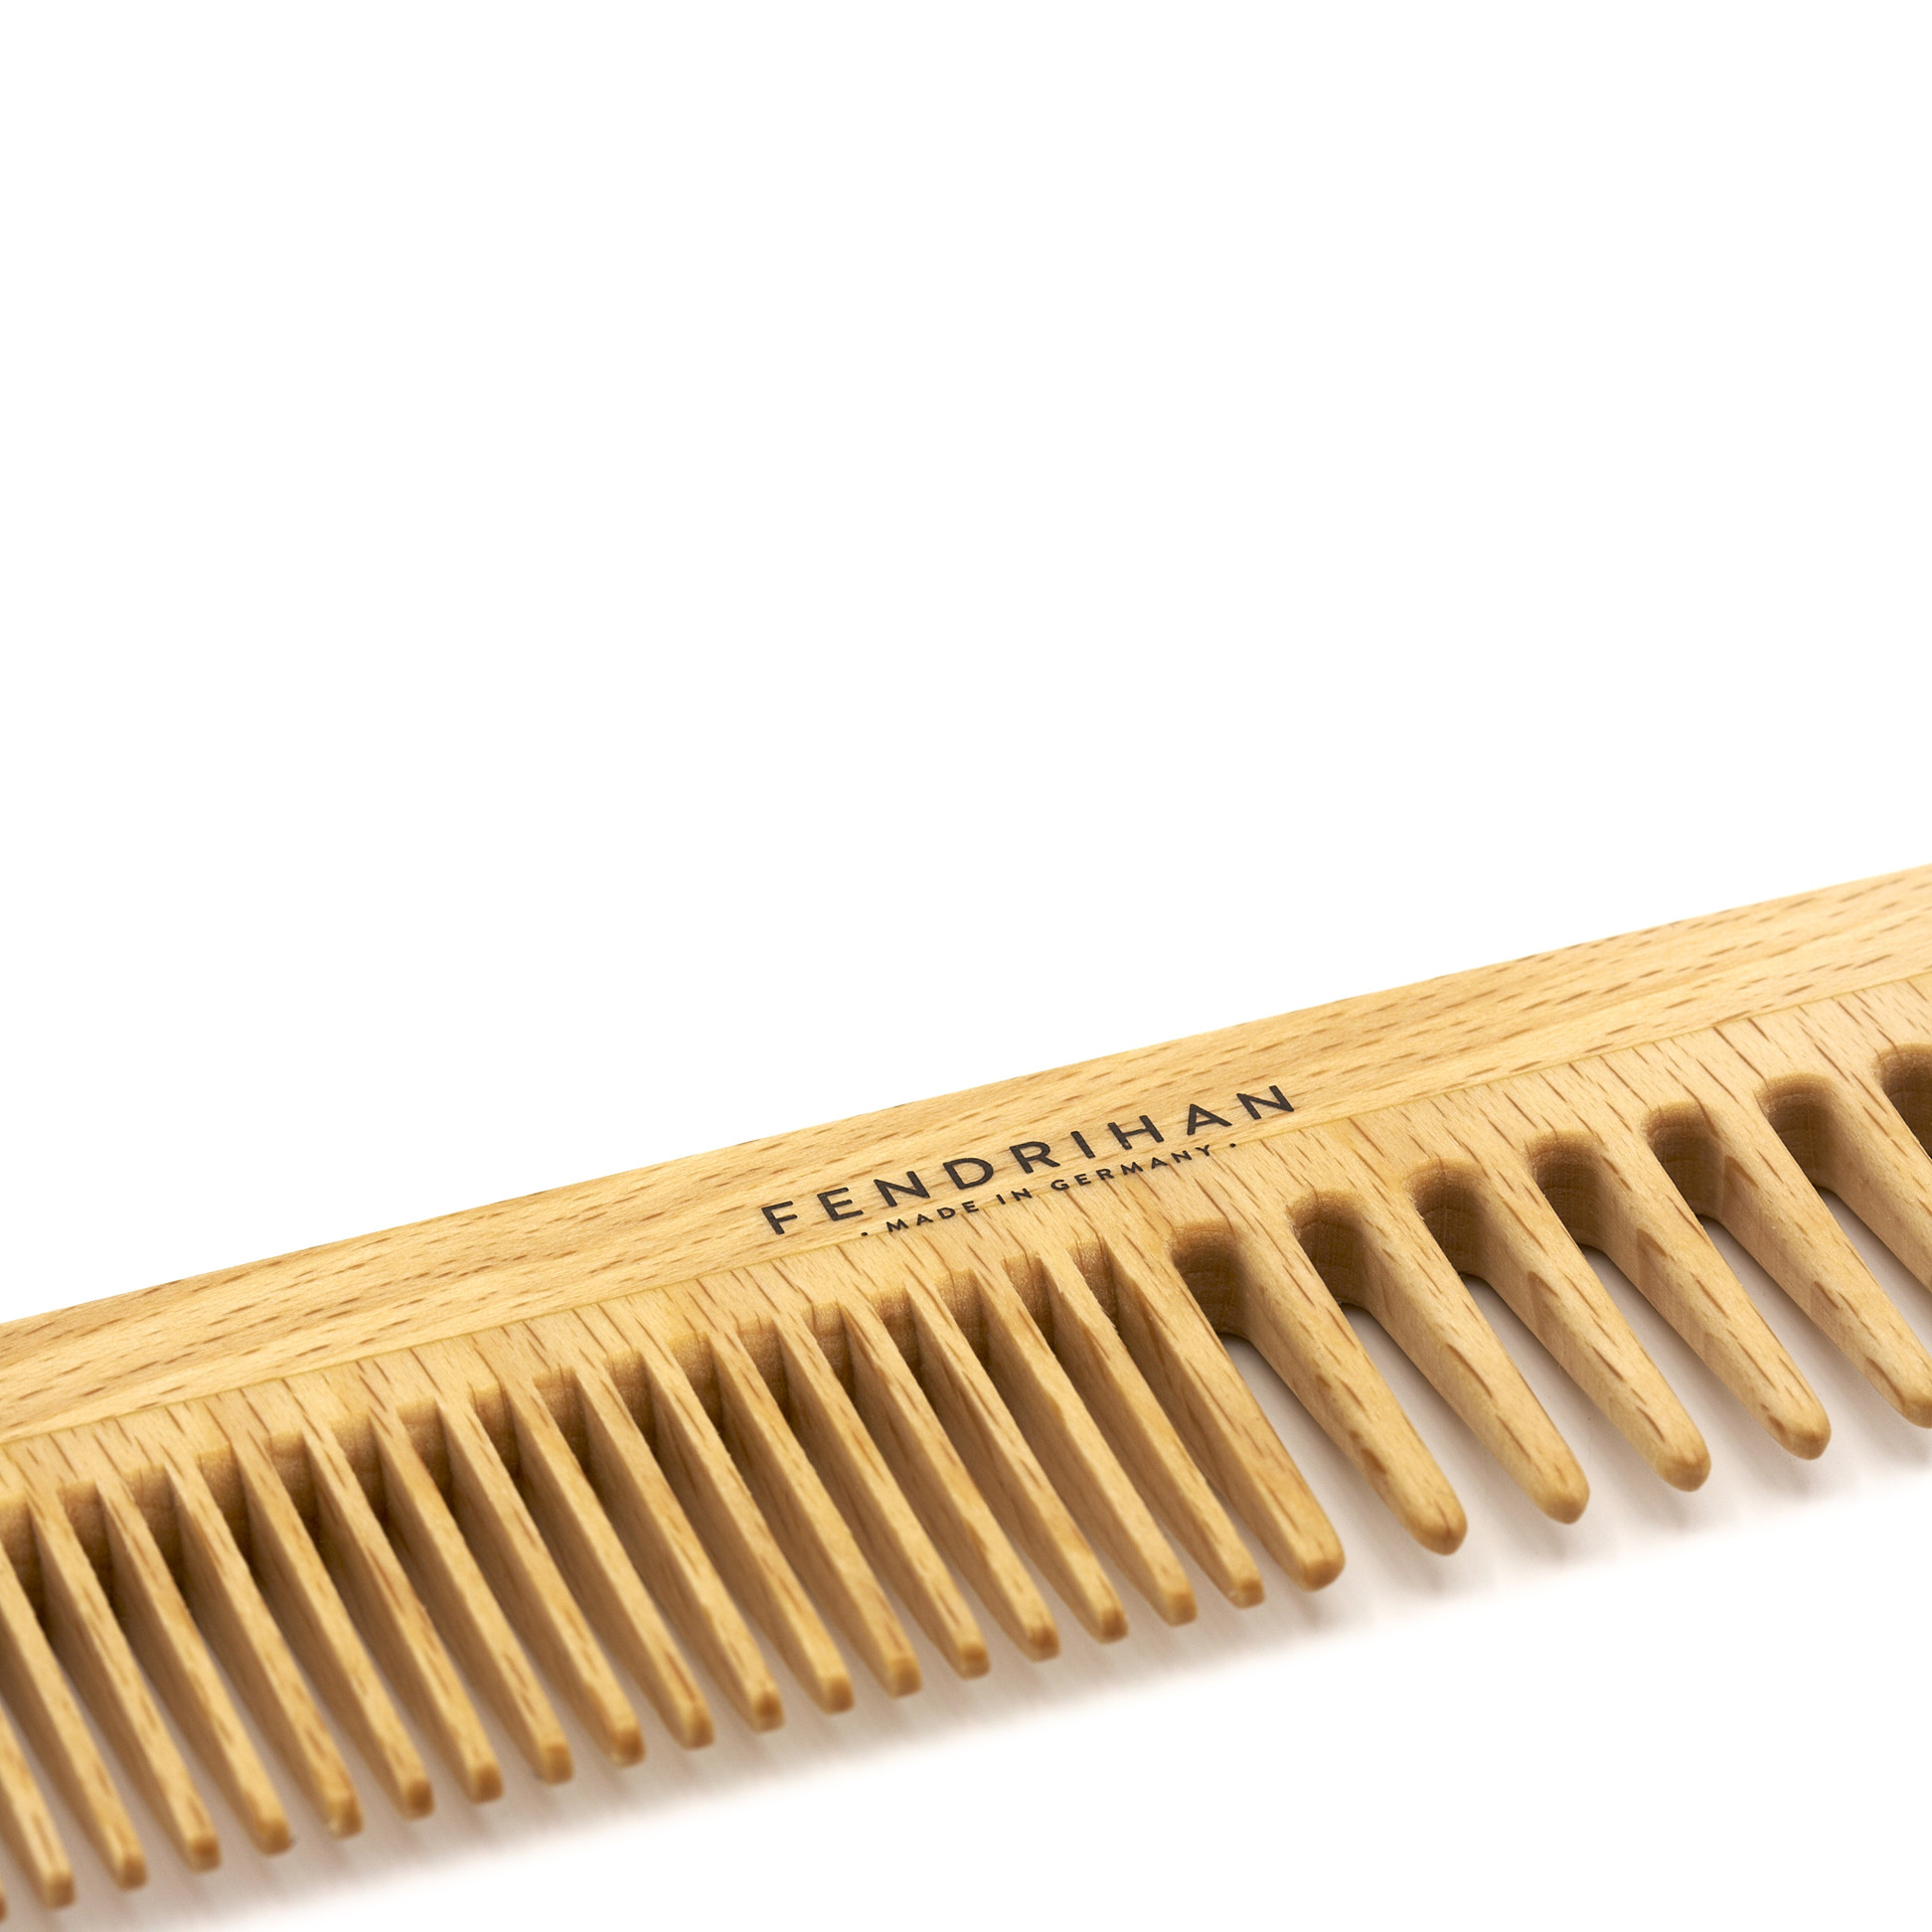 Fendrihan Beech Wood Men's Comb - $16.00